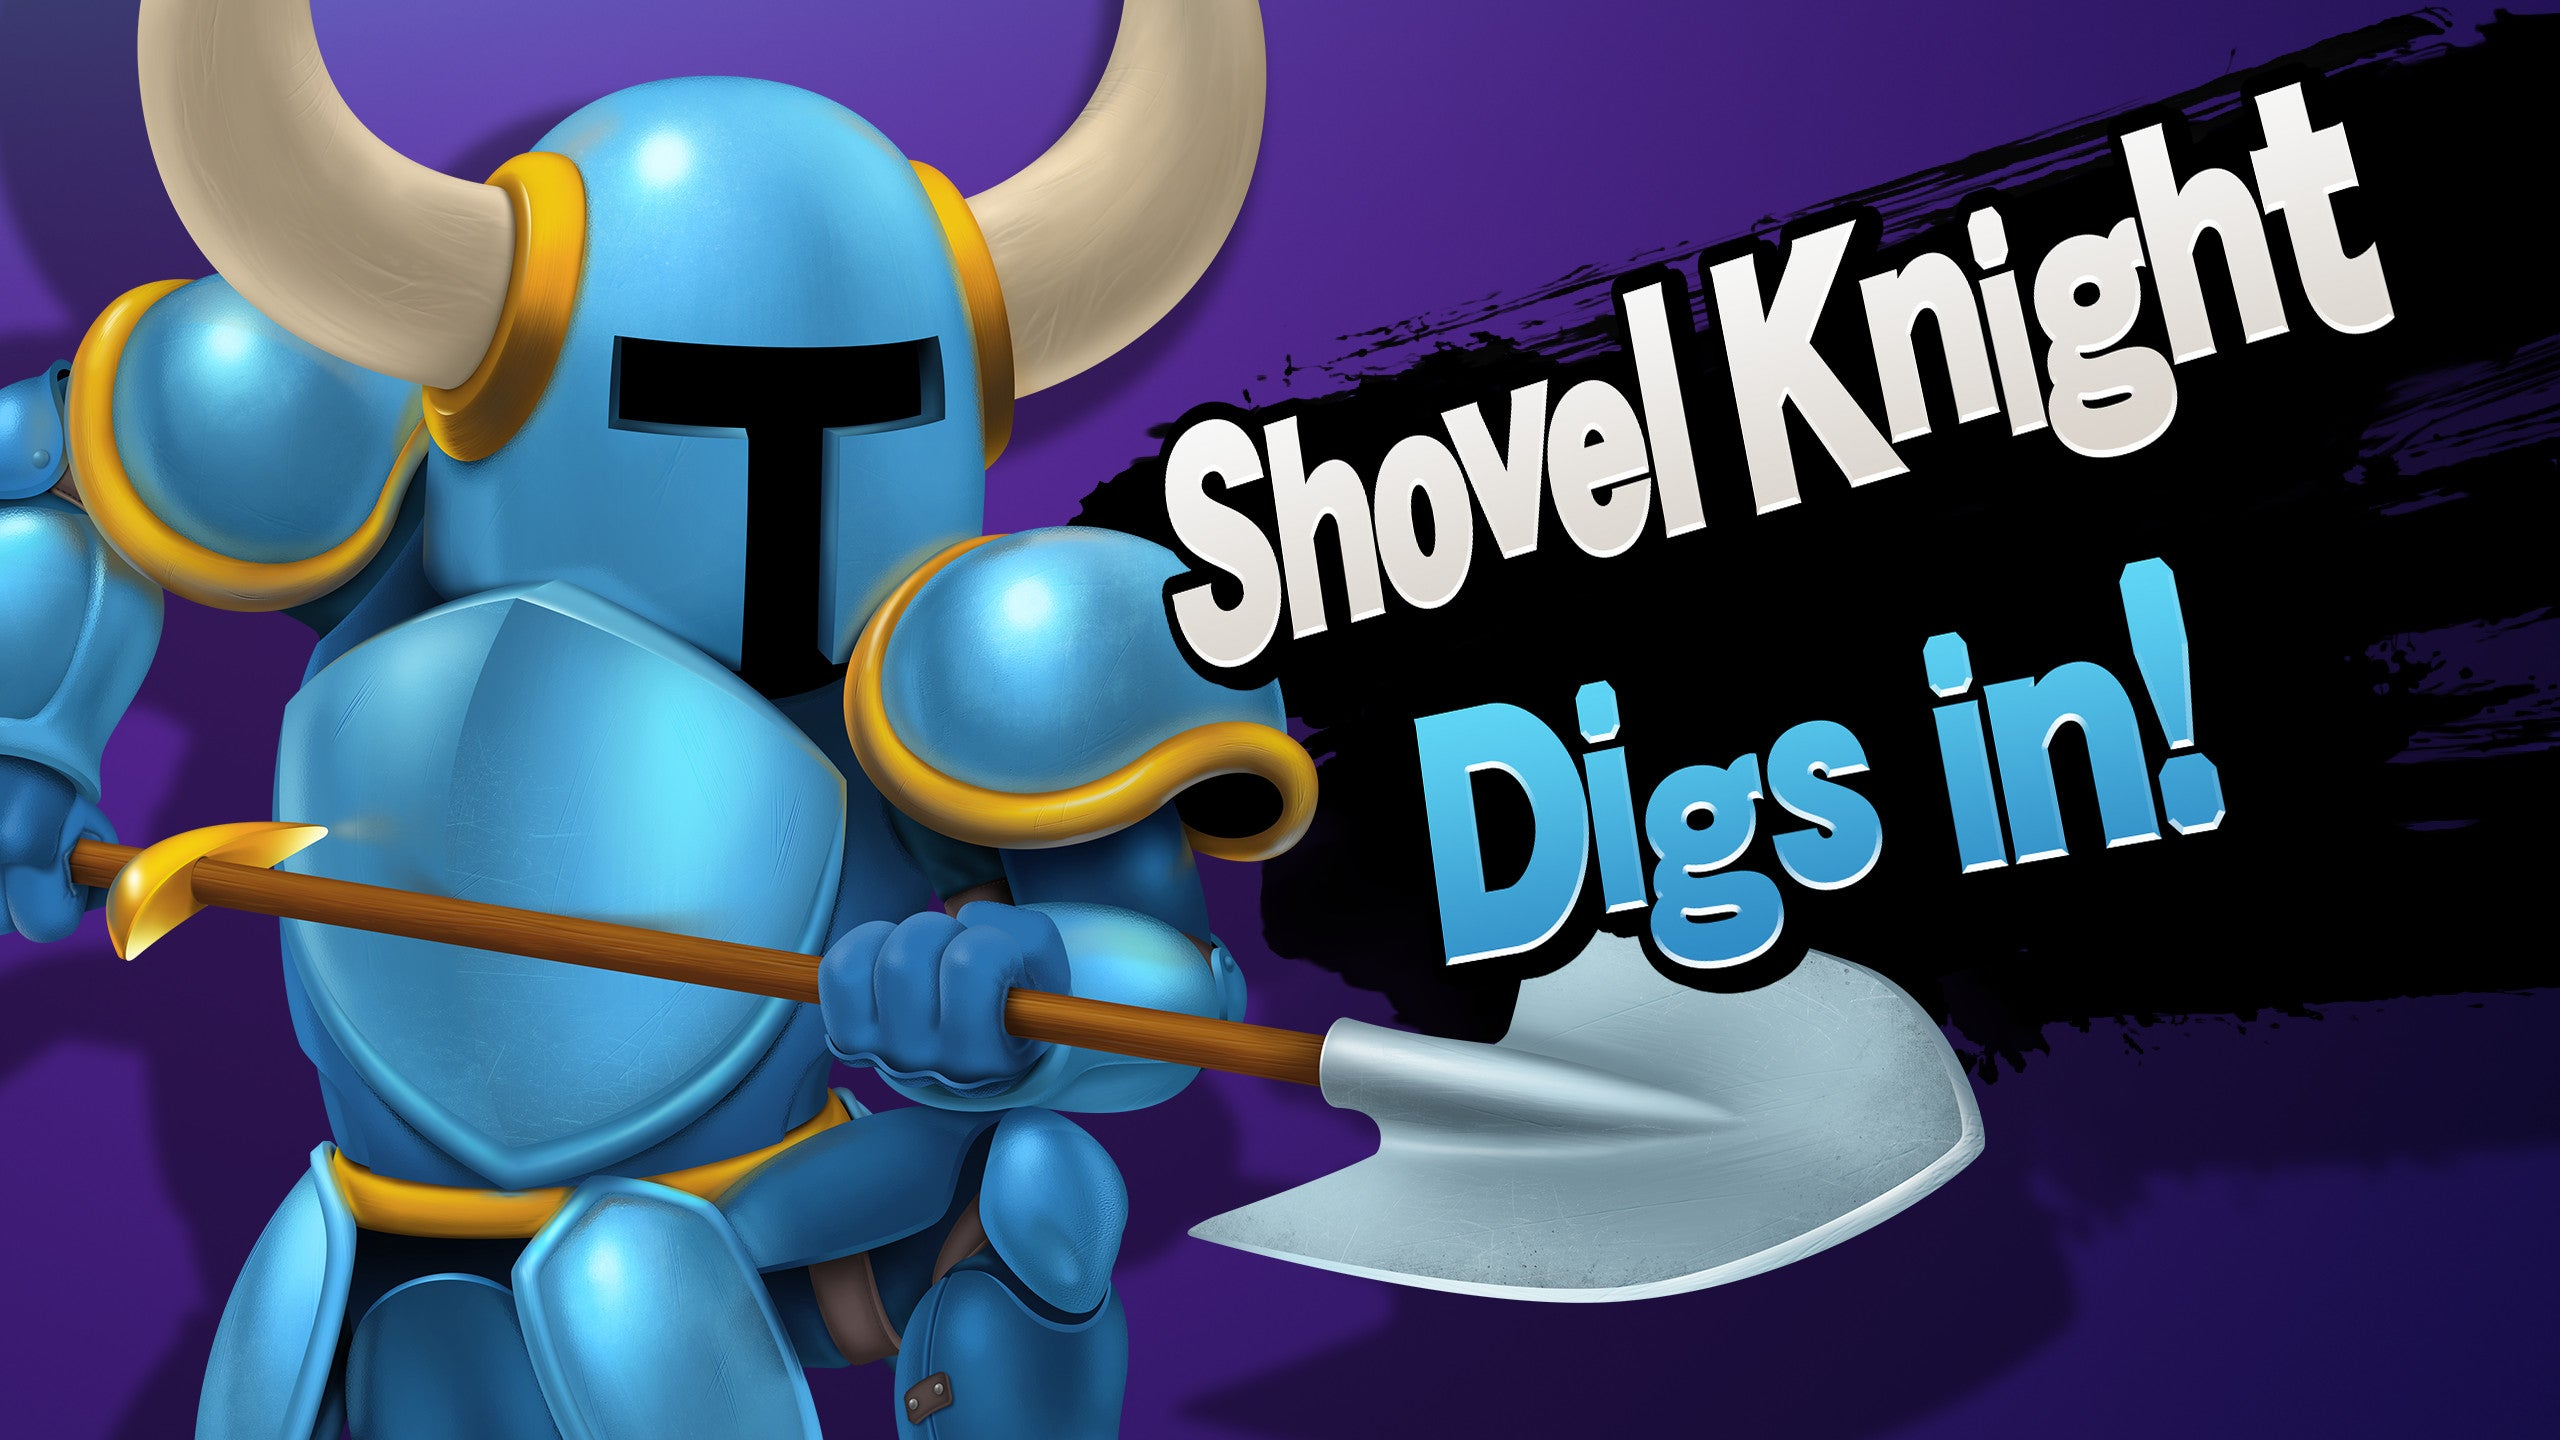 Shovel Knight em Super Smash Bros. Wchjayb95jjmaonglqxo